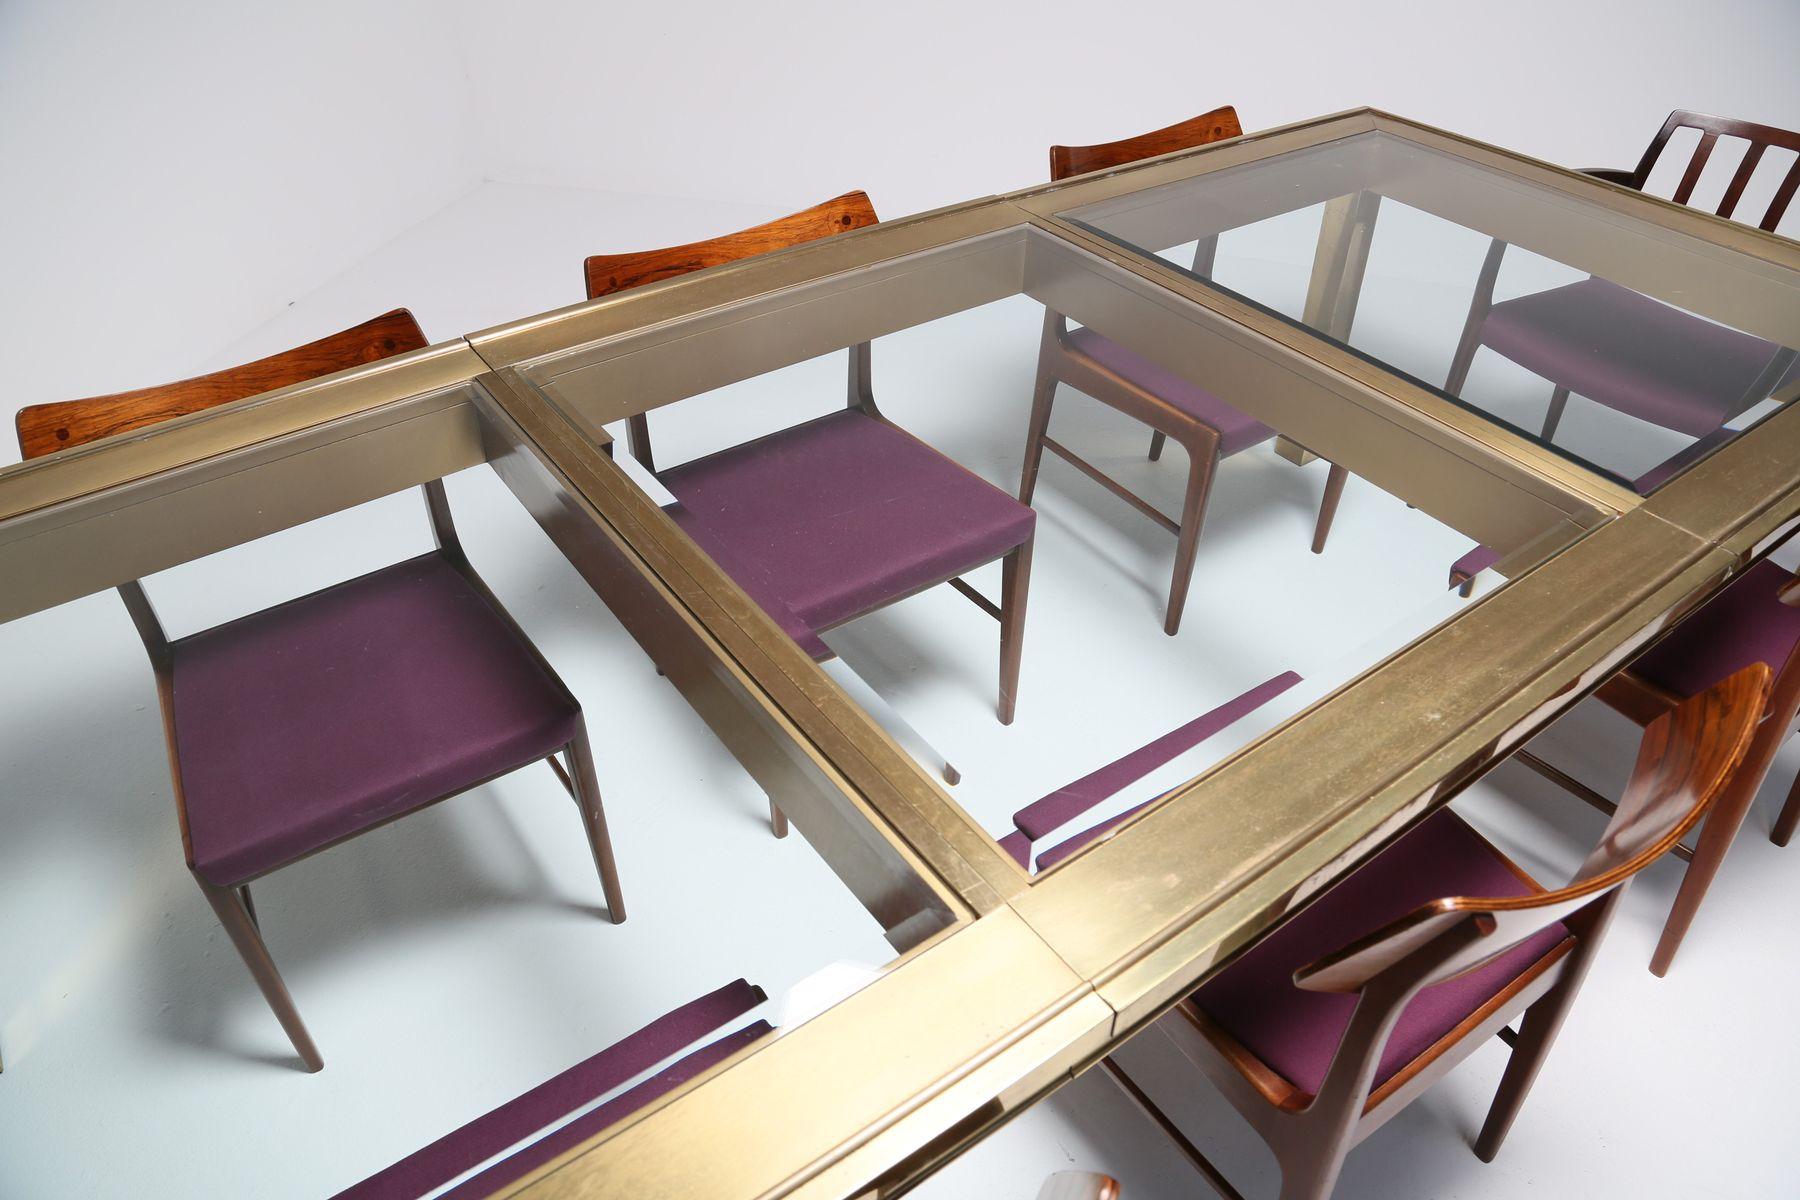 Mastercraft brass dining table - Mastercraft Brass Dining Table Brass Dining Table From Mastercraft 12 Download